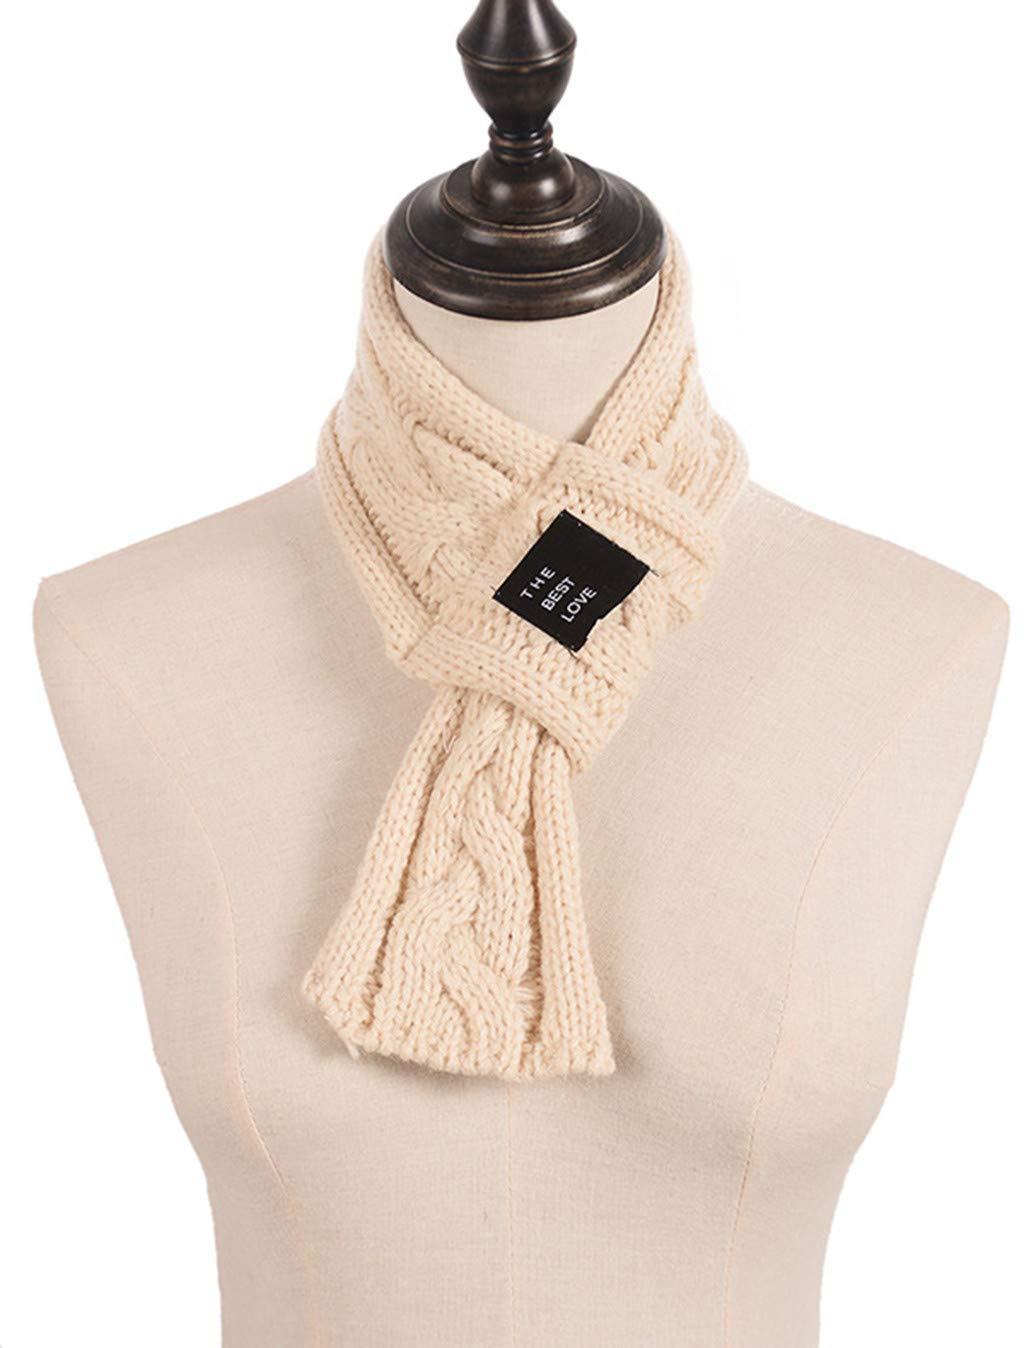 Clearance Kumike Fashion Women Lady Warm Fashion Knit Cross Solid Crochet Scarf Neckerchief